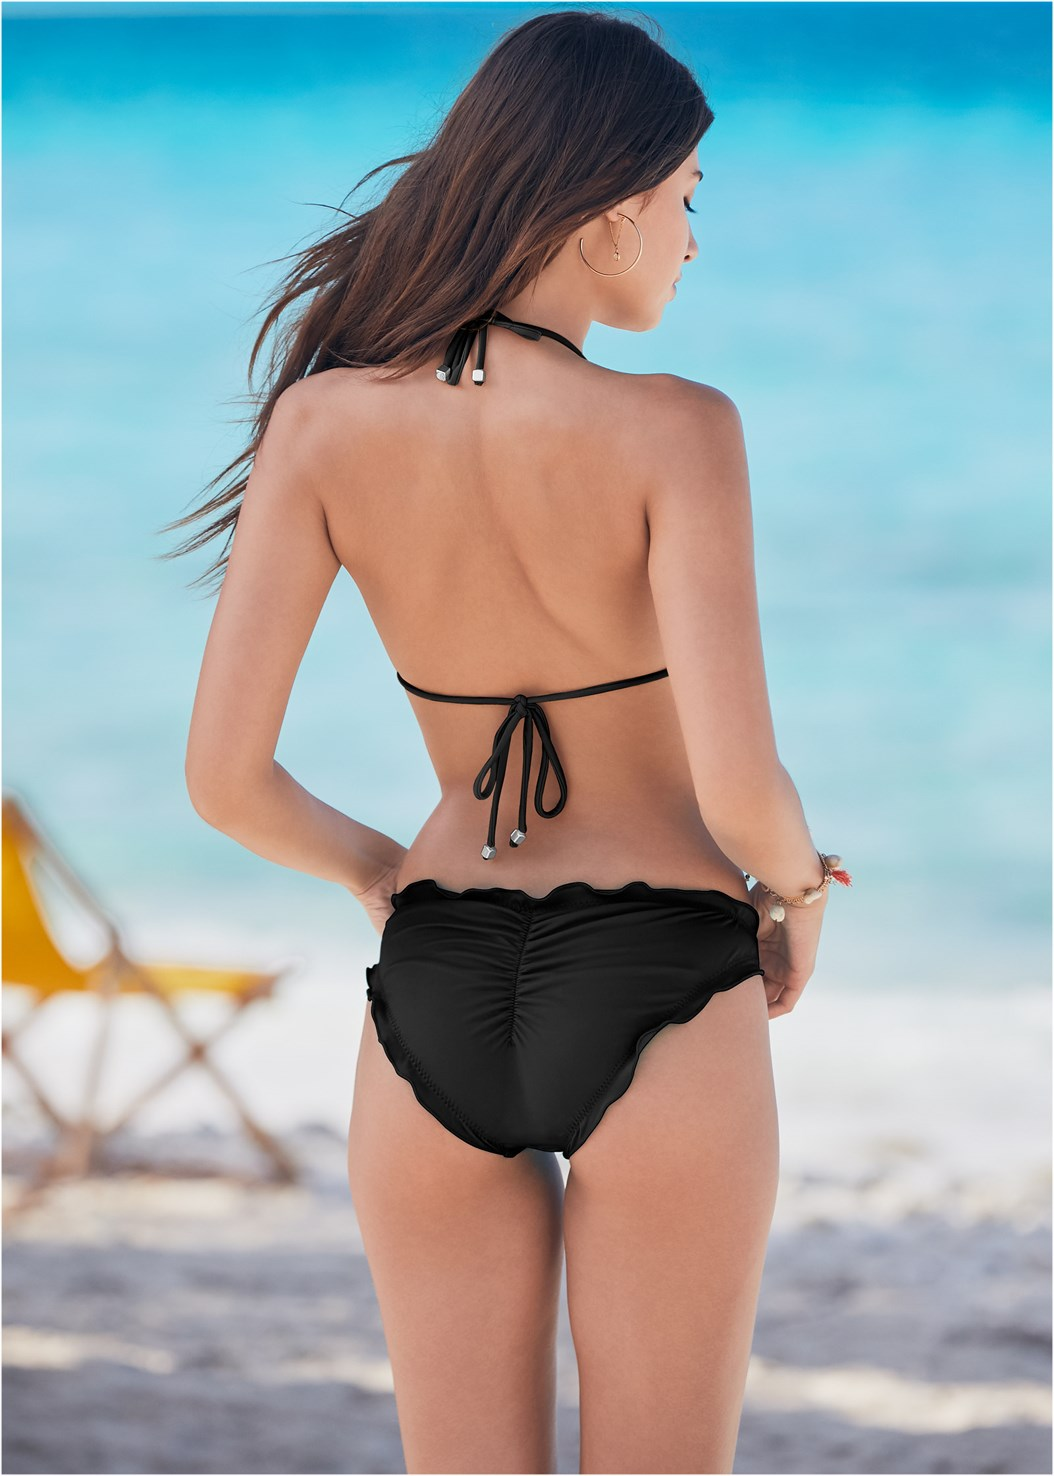 Ruffle Scrunch Back Bottom,Triangle String Bikini Top,Enhancer Push Up Ring Halter Triangle Top ,Ballet Swim Top,Bling Cover-Up Kimono